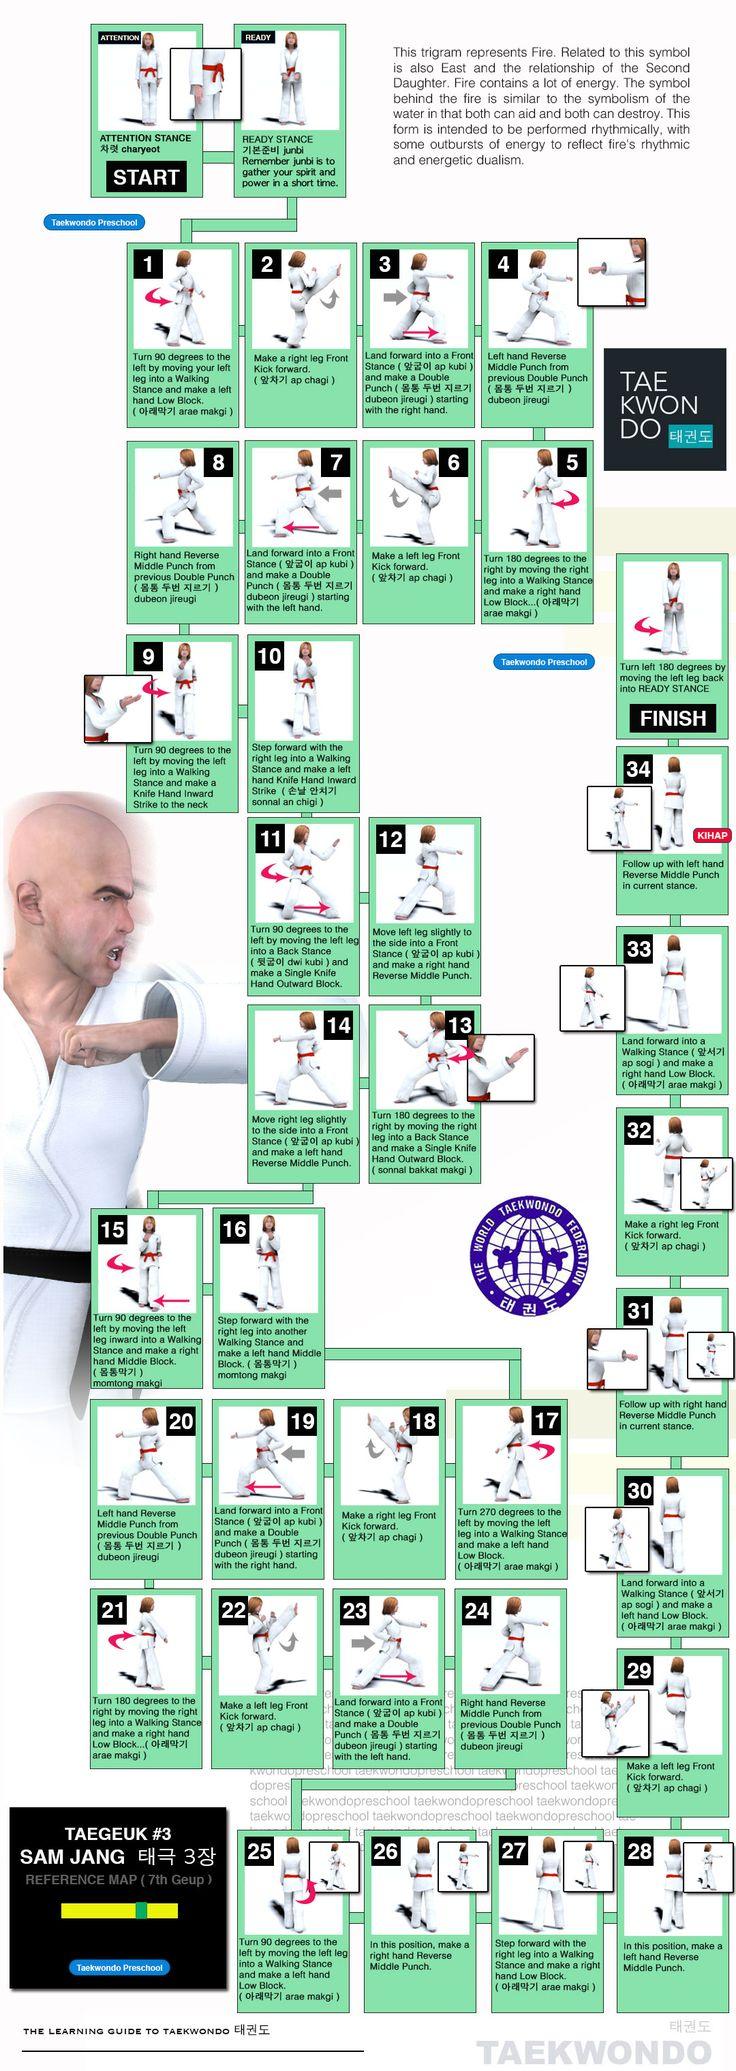 Taegeuk 3 태극 3장 (Taegeuk Sam-jahng) WTF Taekwondo Poomse Map